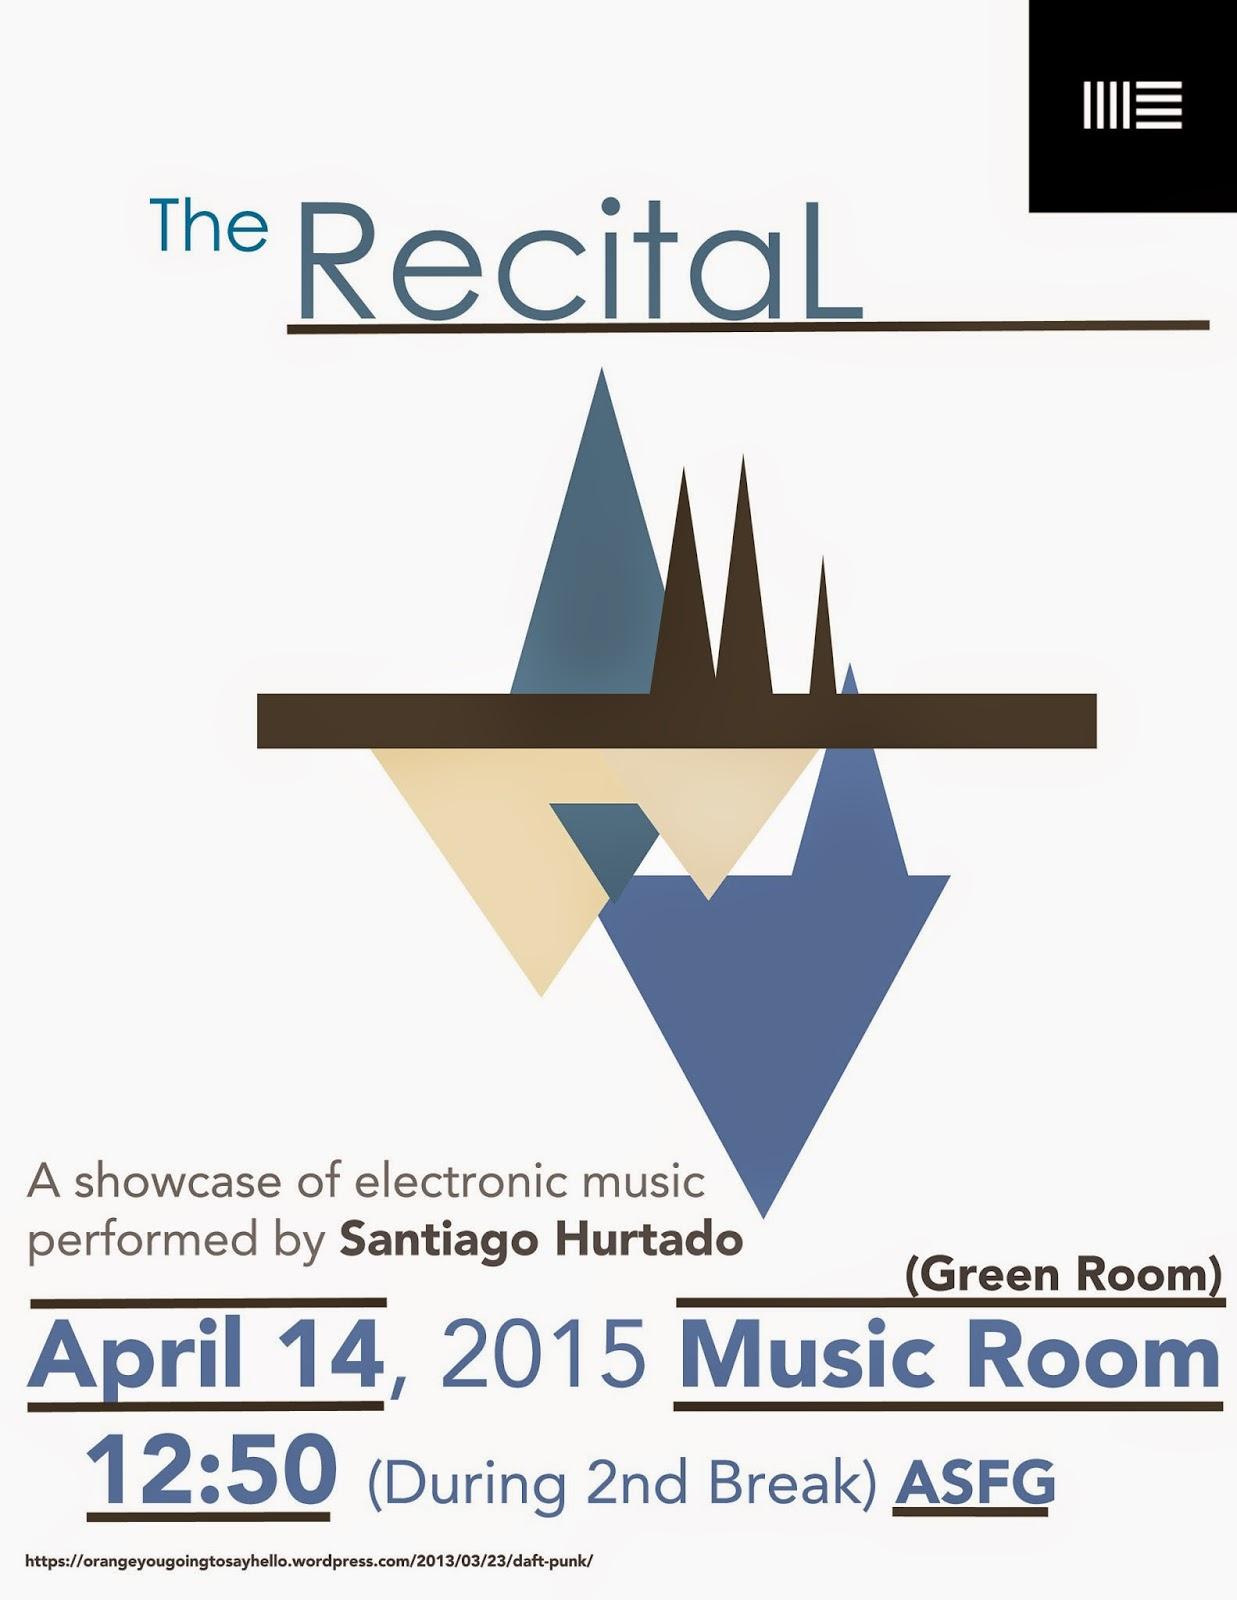 Voice recital poster templates